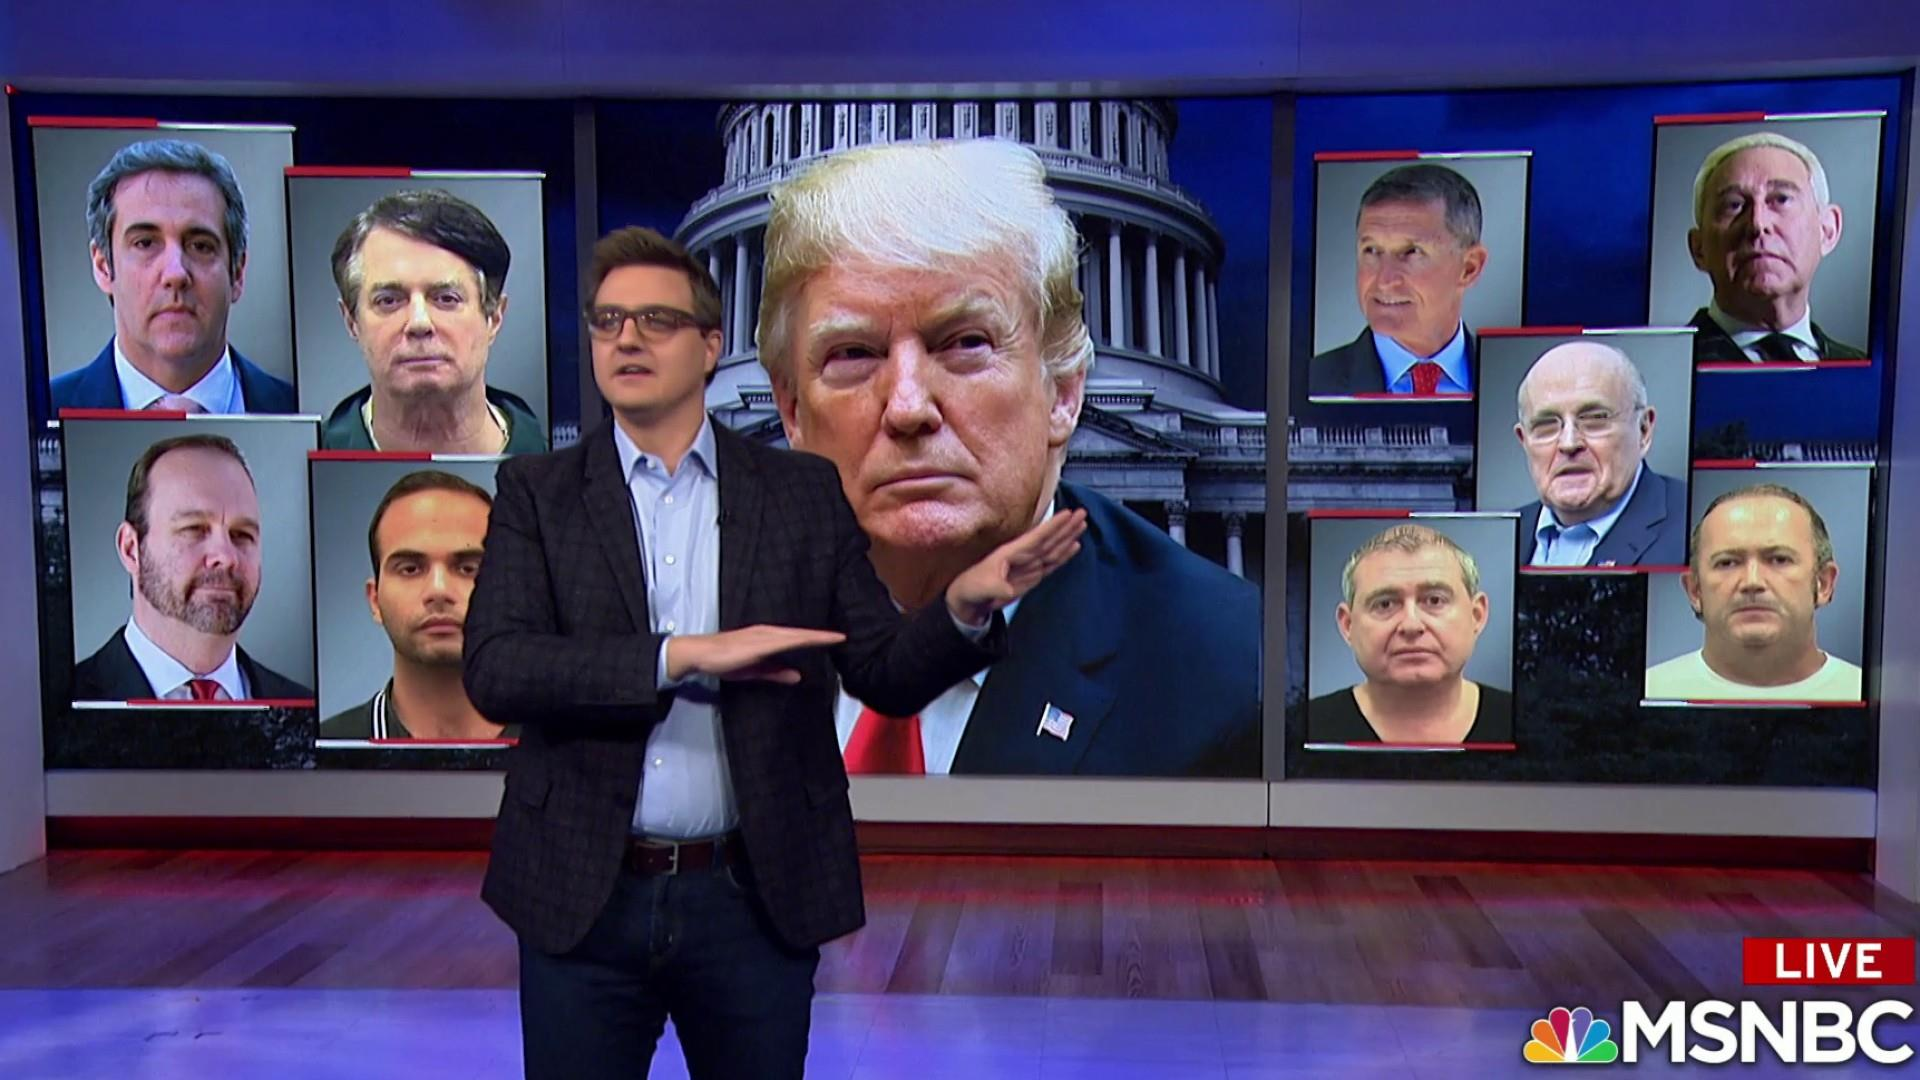 Trump surrounds himself with criminals